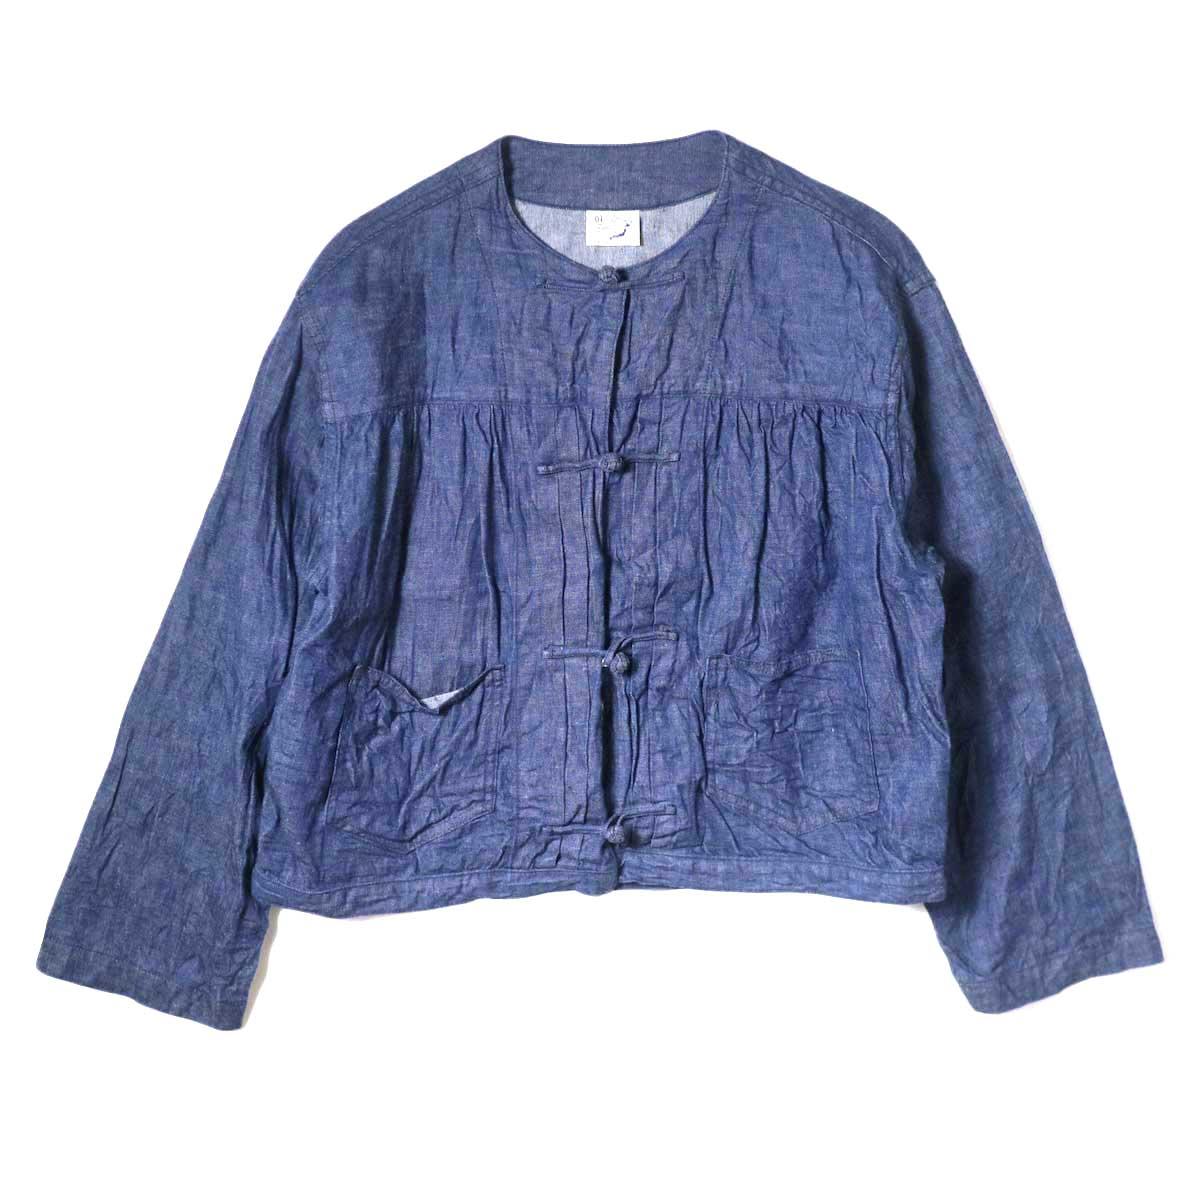 orSlow / Frog Button Denim Shorts Jacket